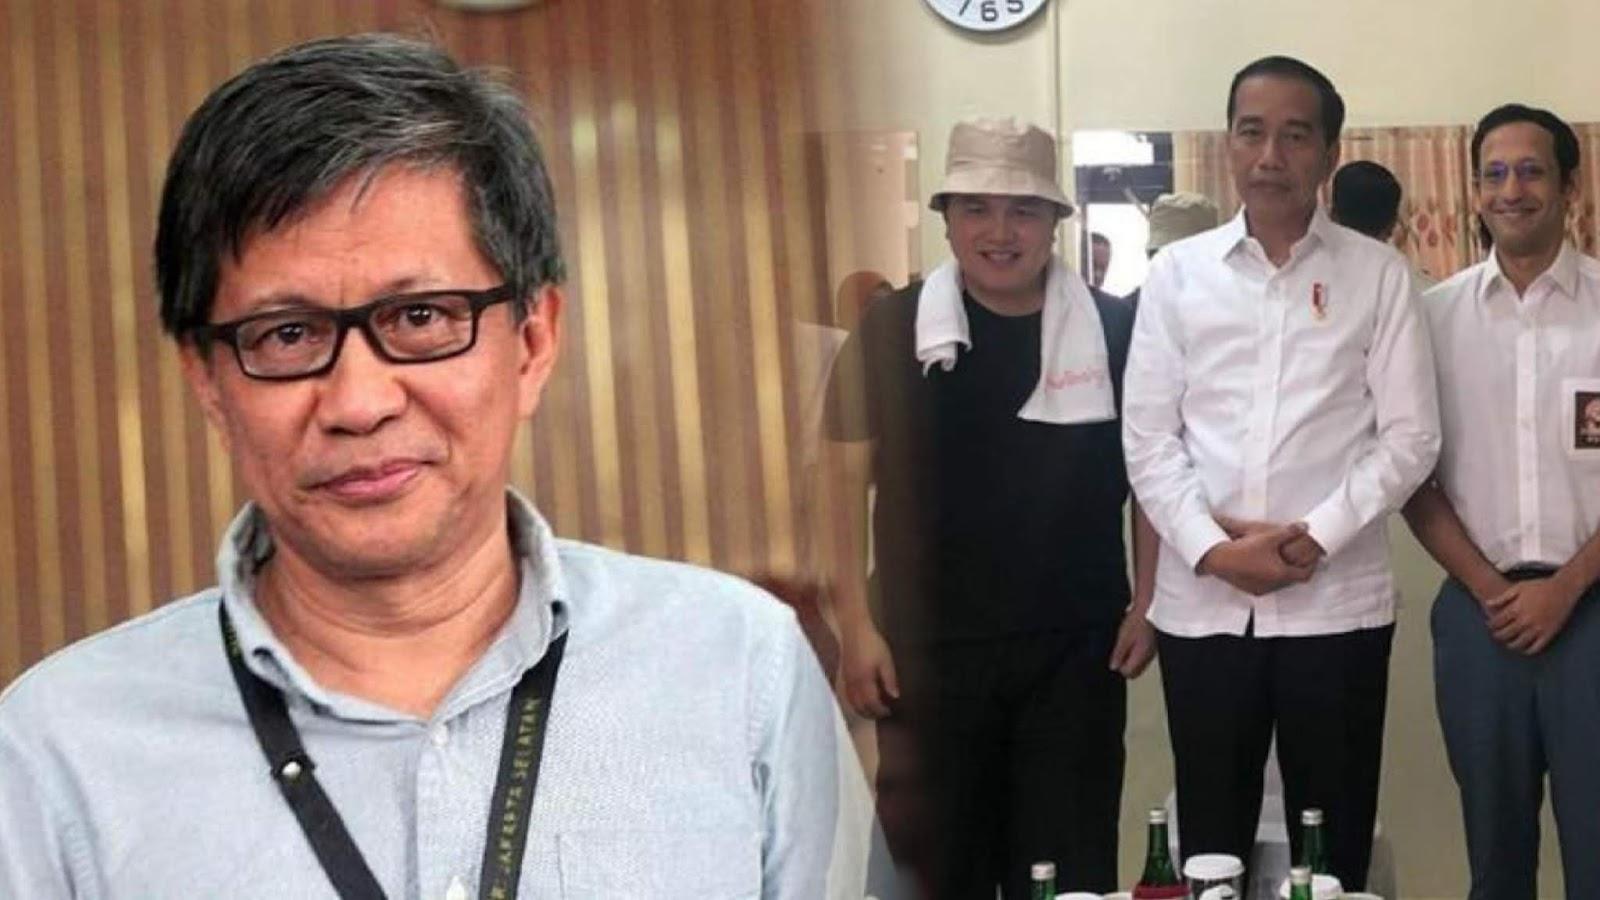 Peringati Hari Korupsi, Rocky Gerung: Mestinya Jokowi Datang ke KPK Pakai Rompi Oranye